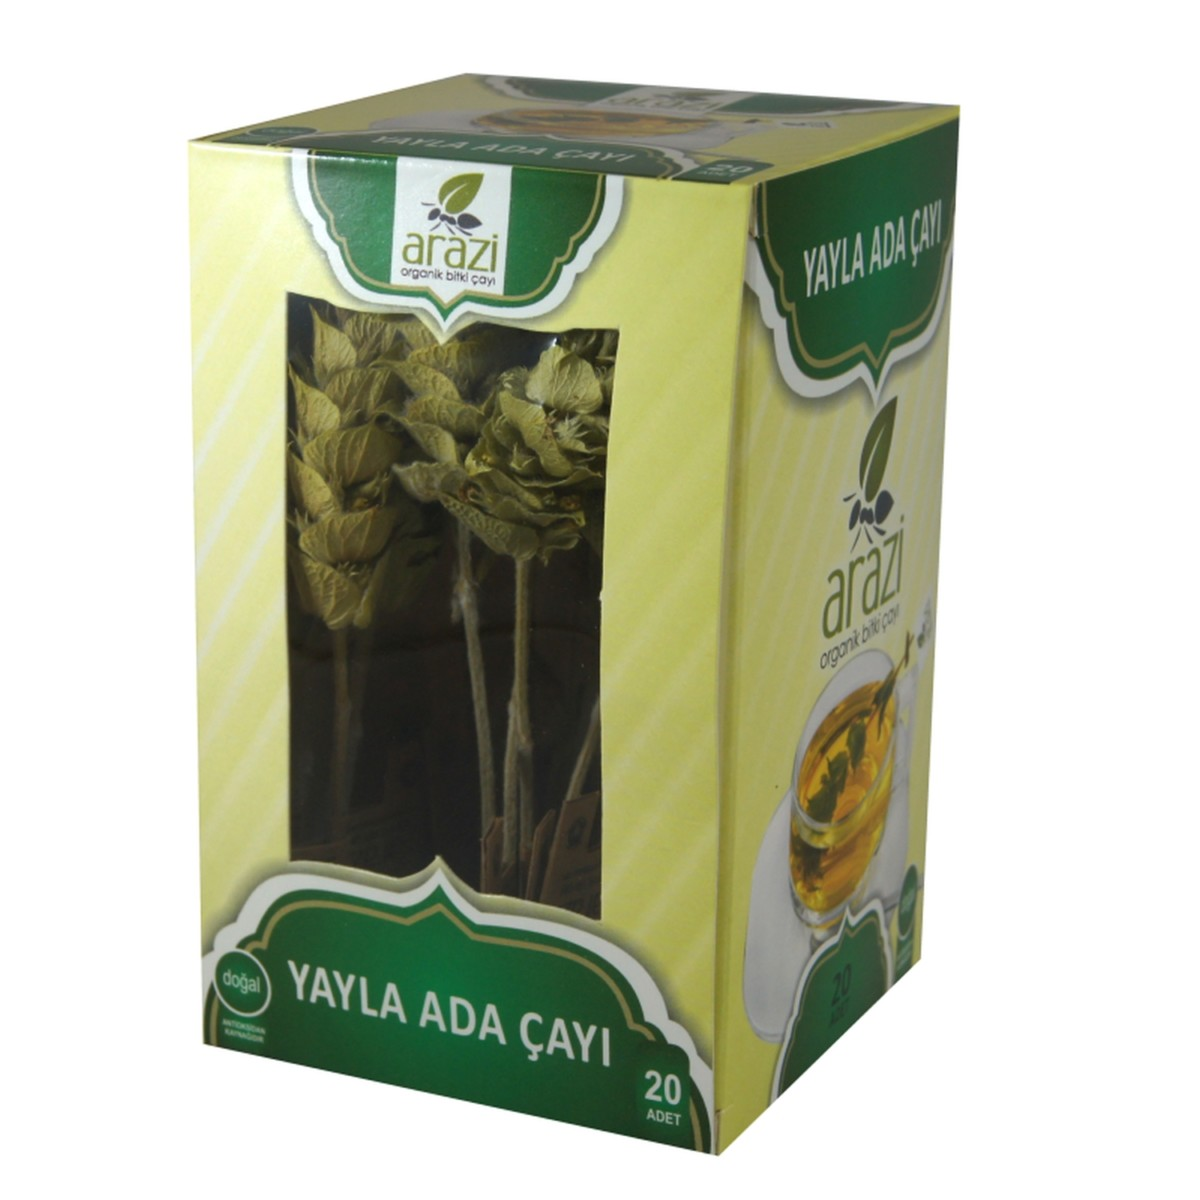 ада чай в коробке